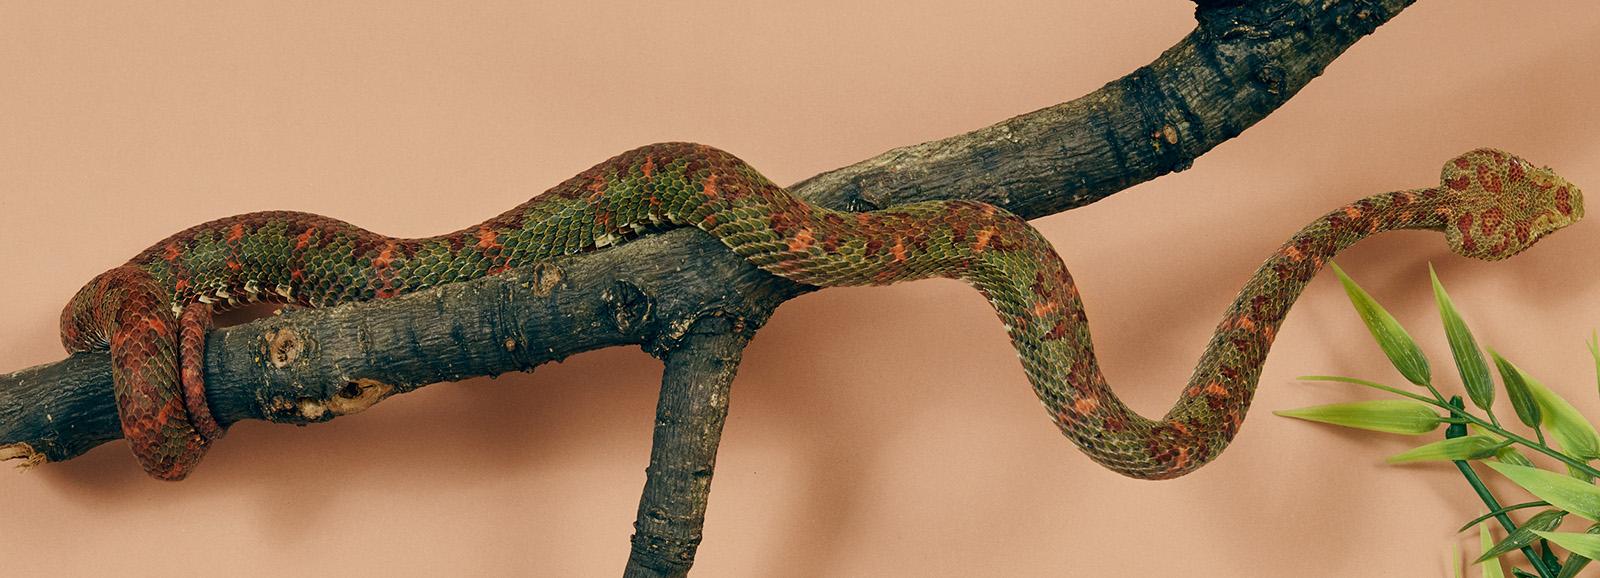 Snake coiled around branch of wood. (Image: Nick Ballon)